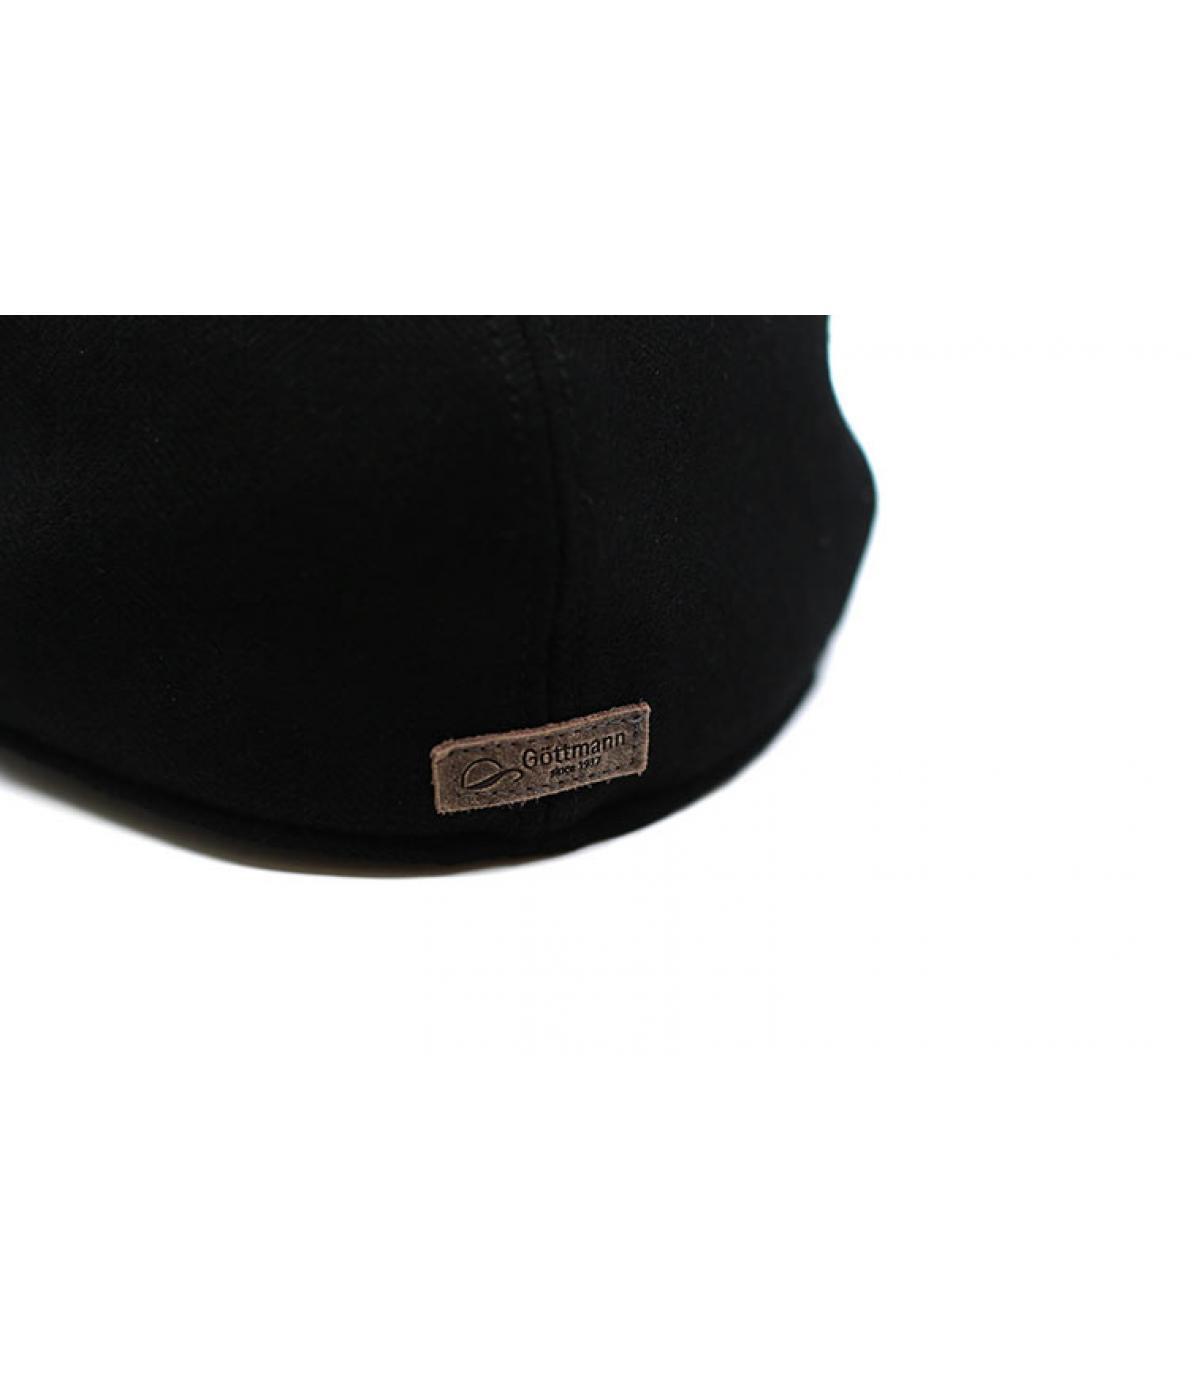 Dettagli Brentford Wool black - image 3